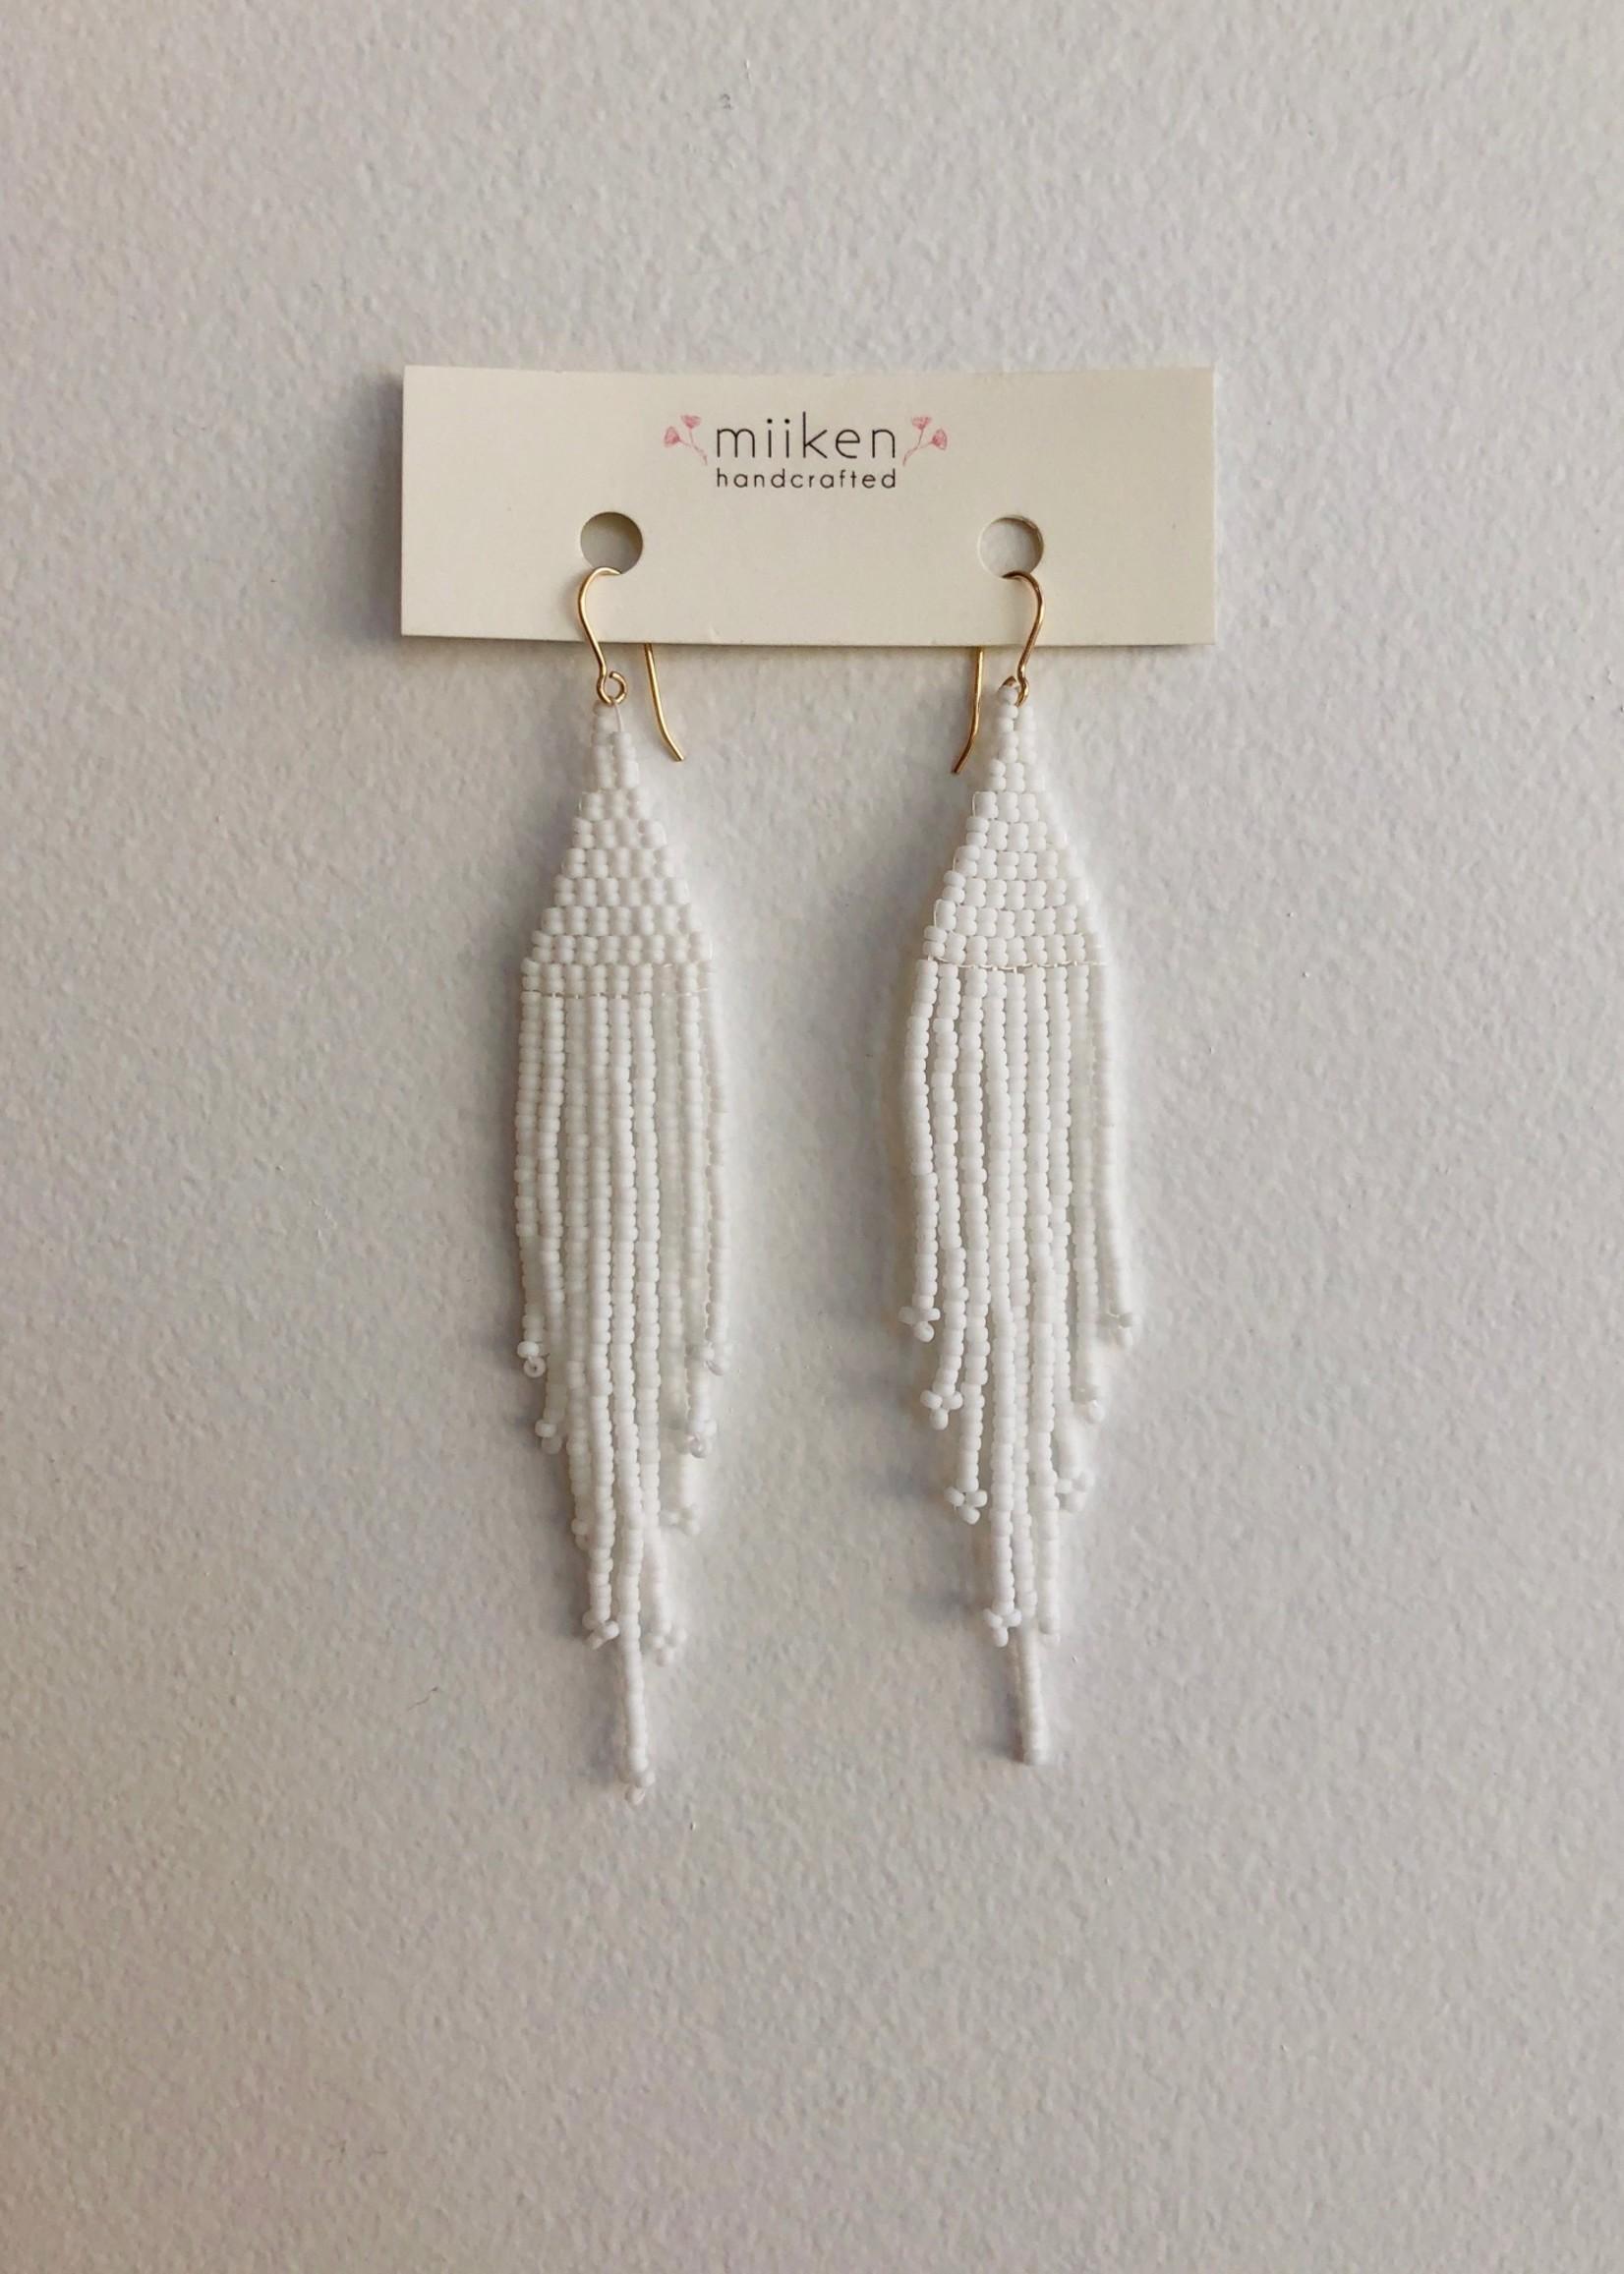 Miiken Handcrafted Fringe Earrings by Miiken Handcrafted